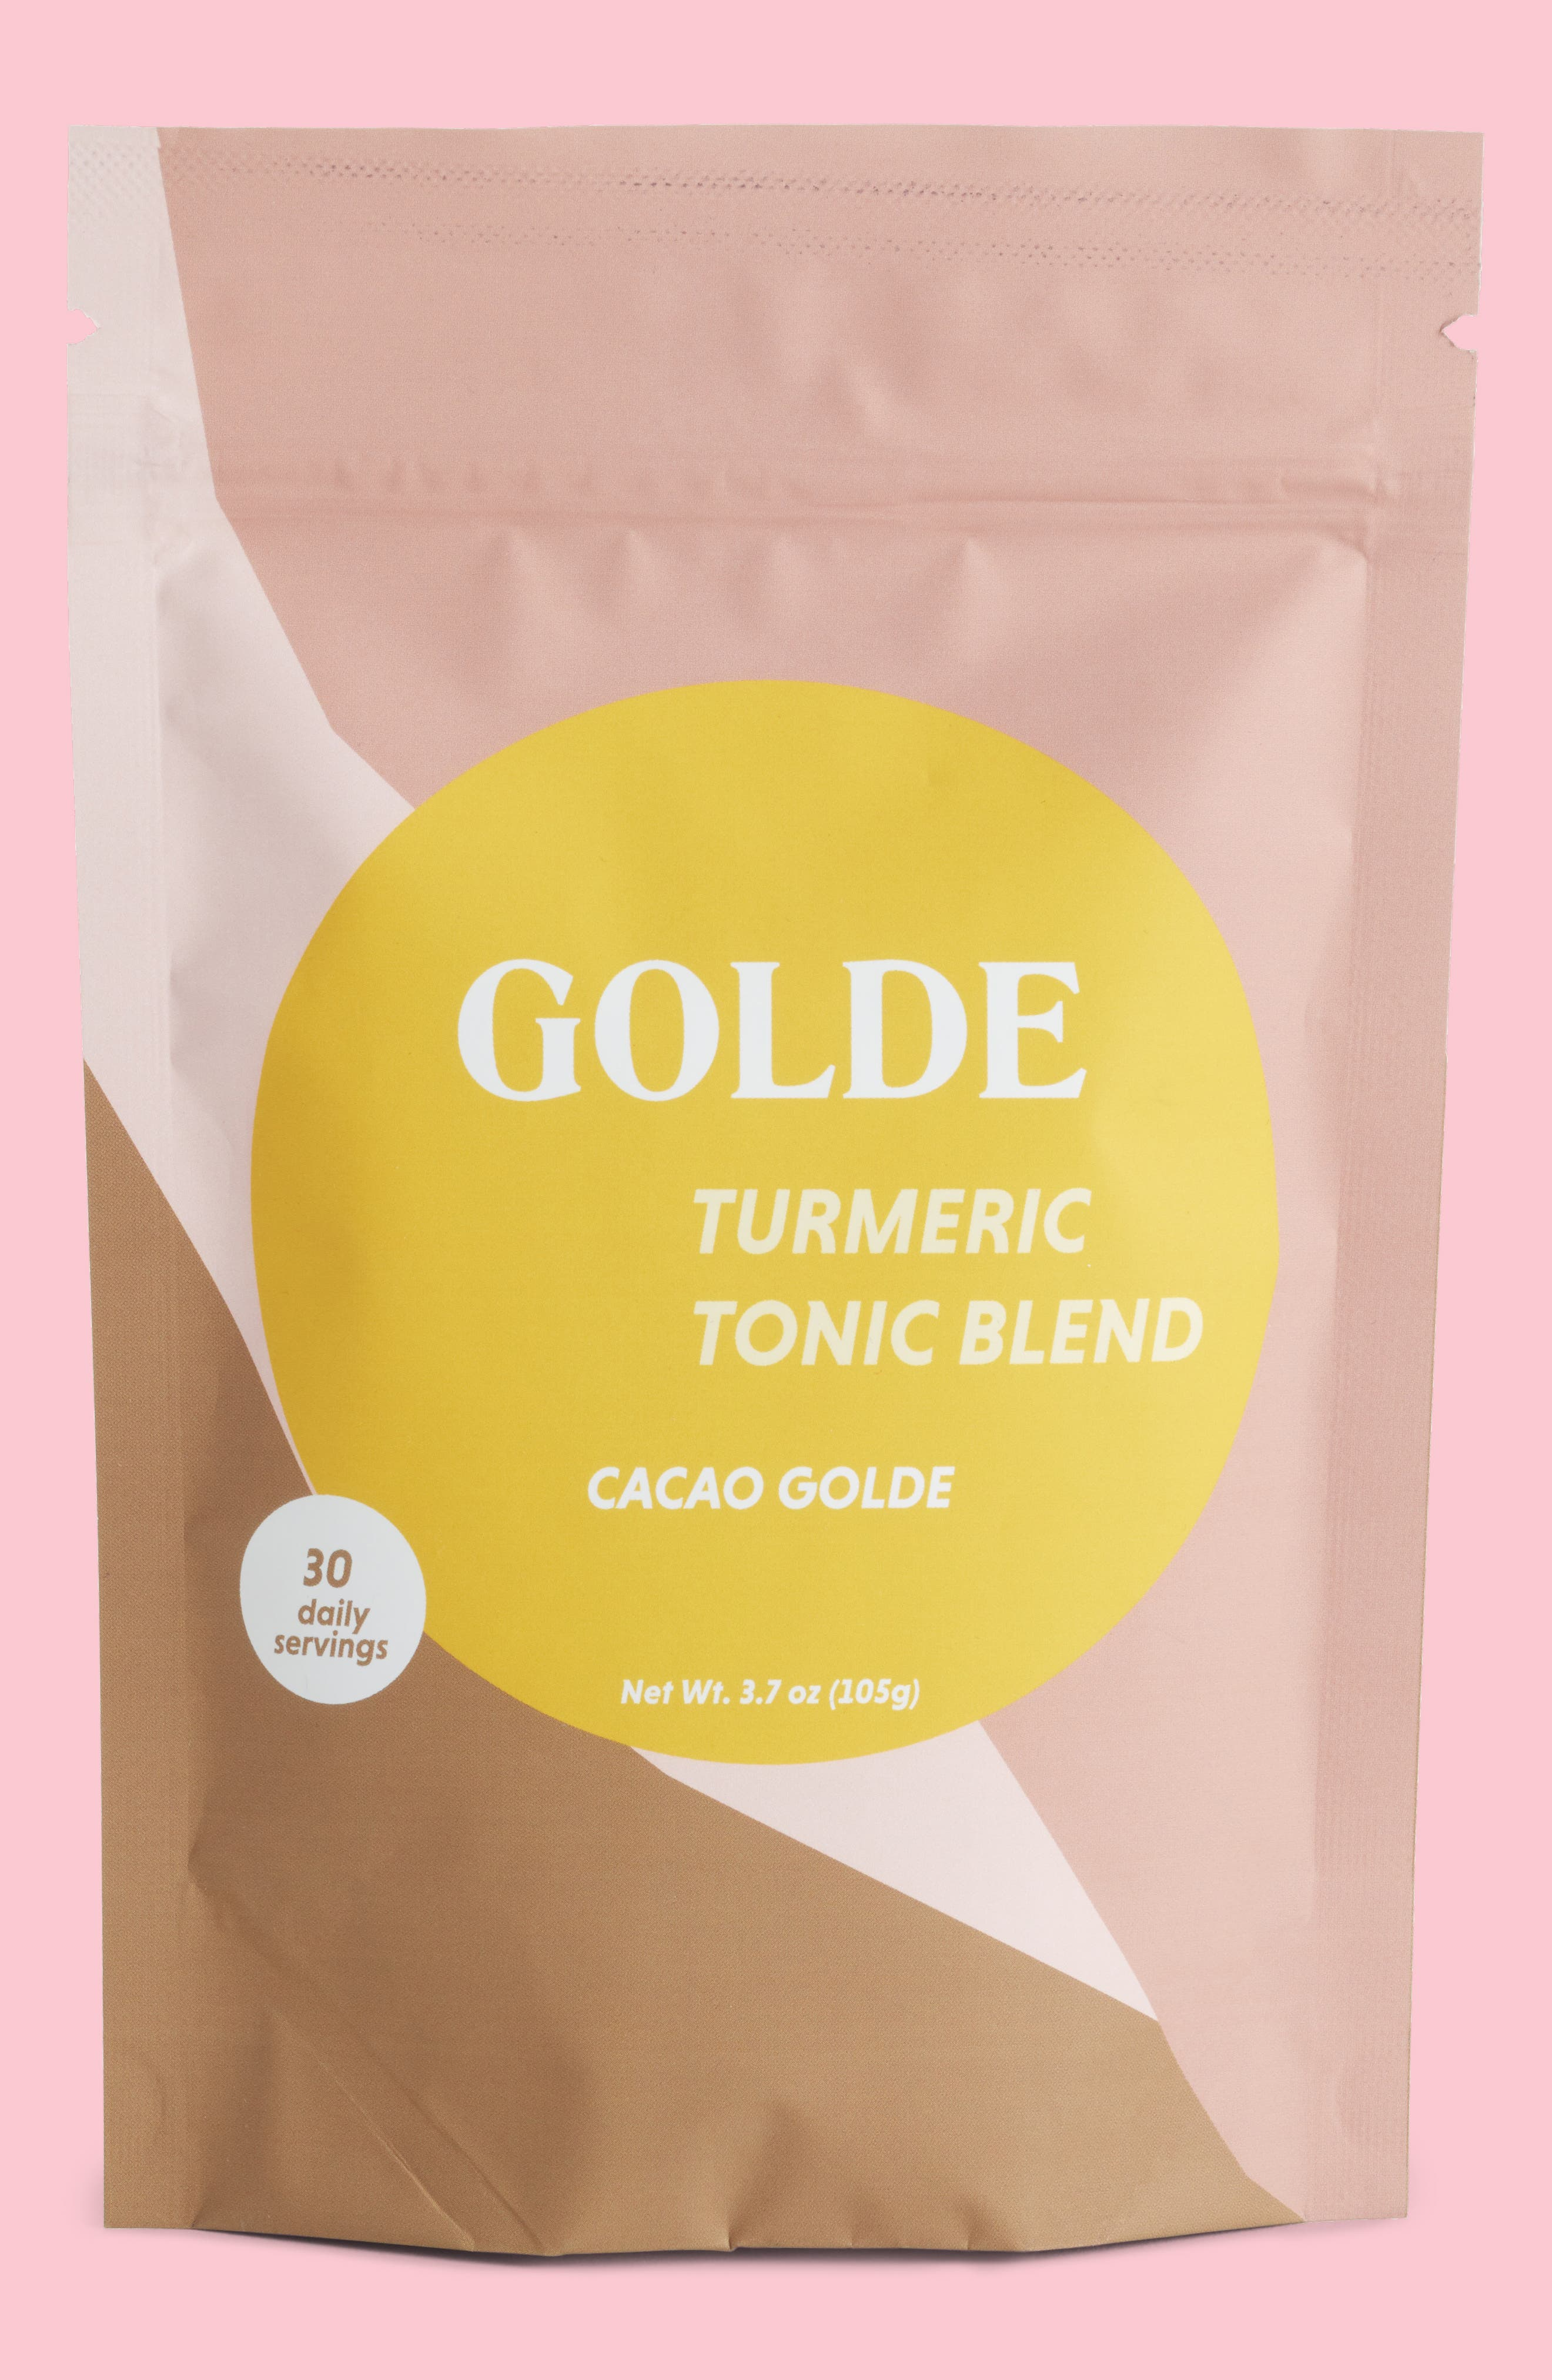 Golde Cacao Golde Turmeric Tonic Blend,                         Main,                         color, None